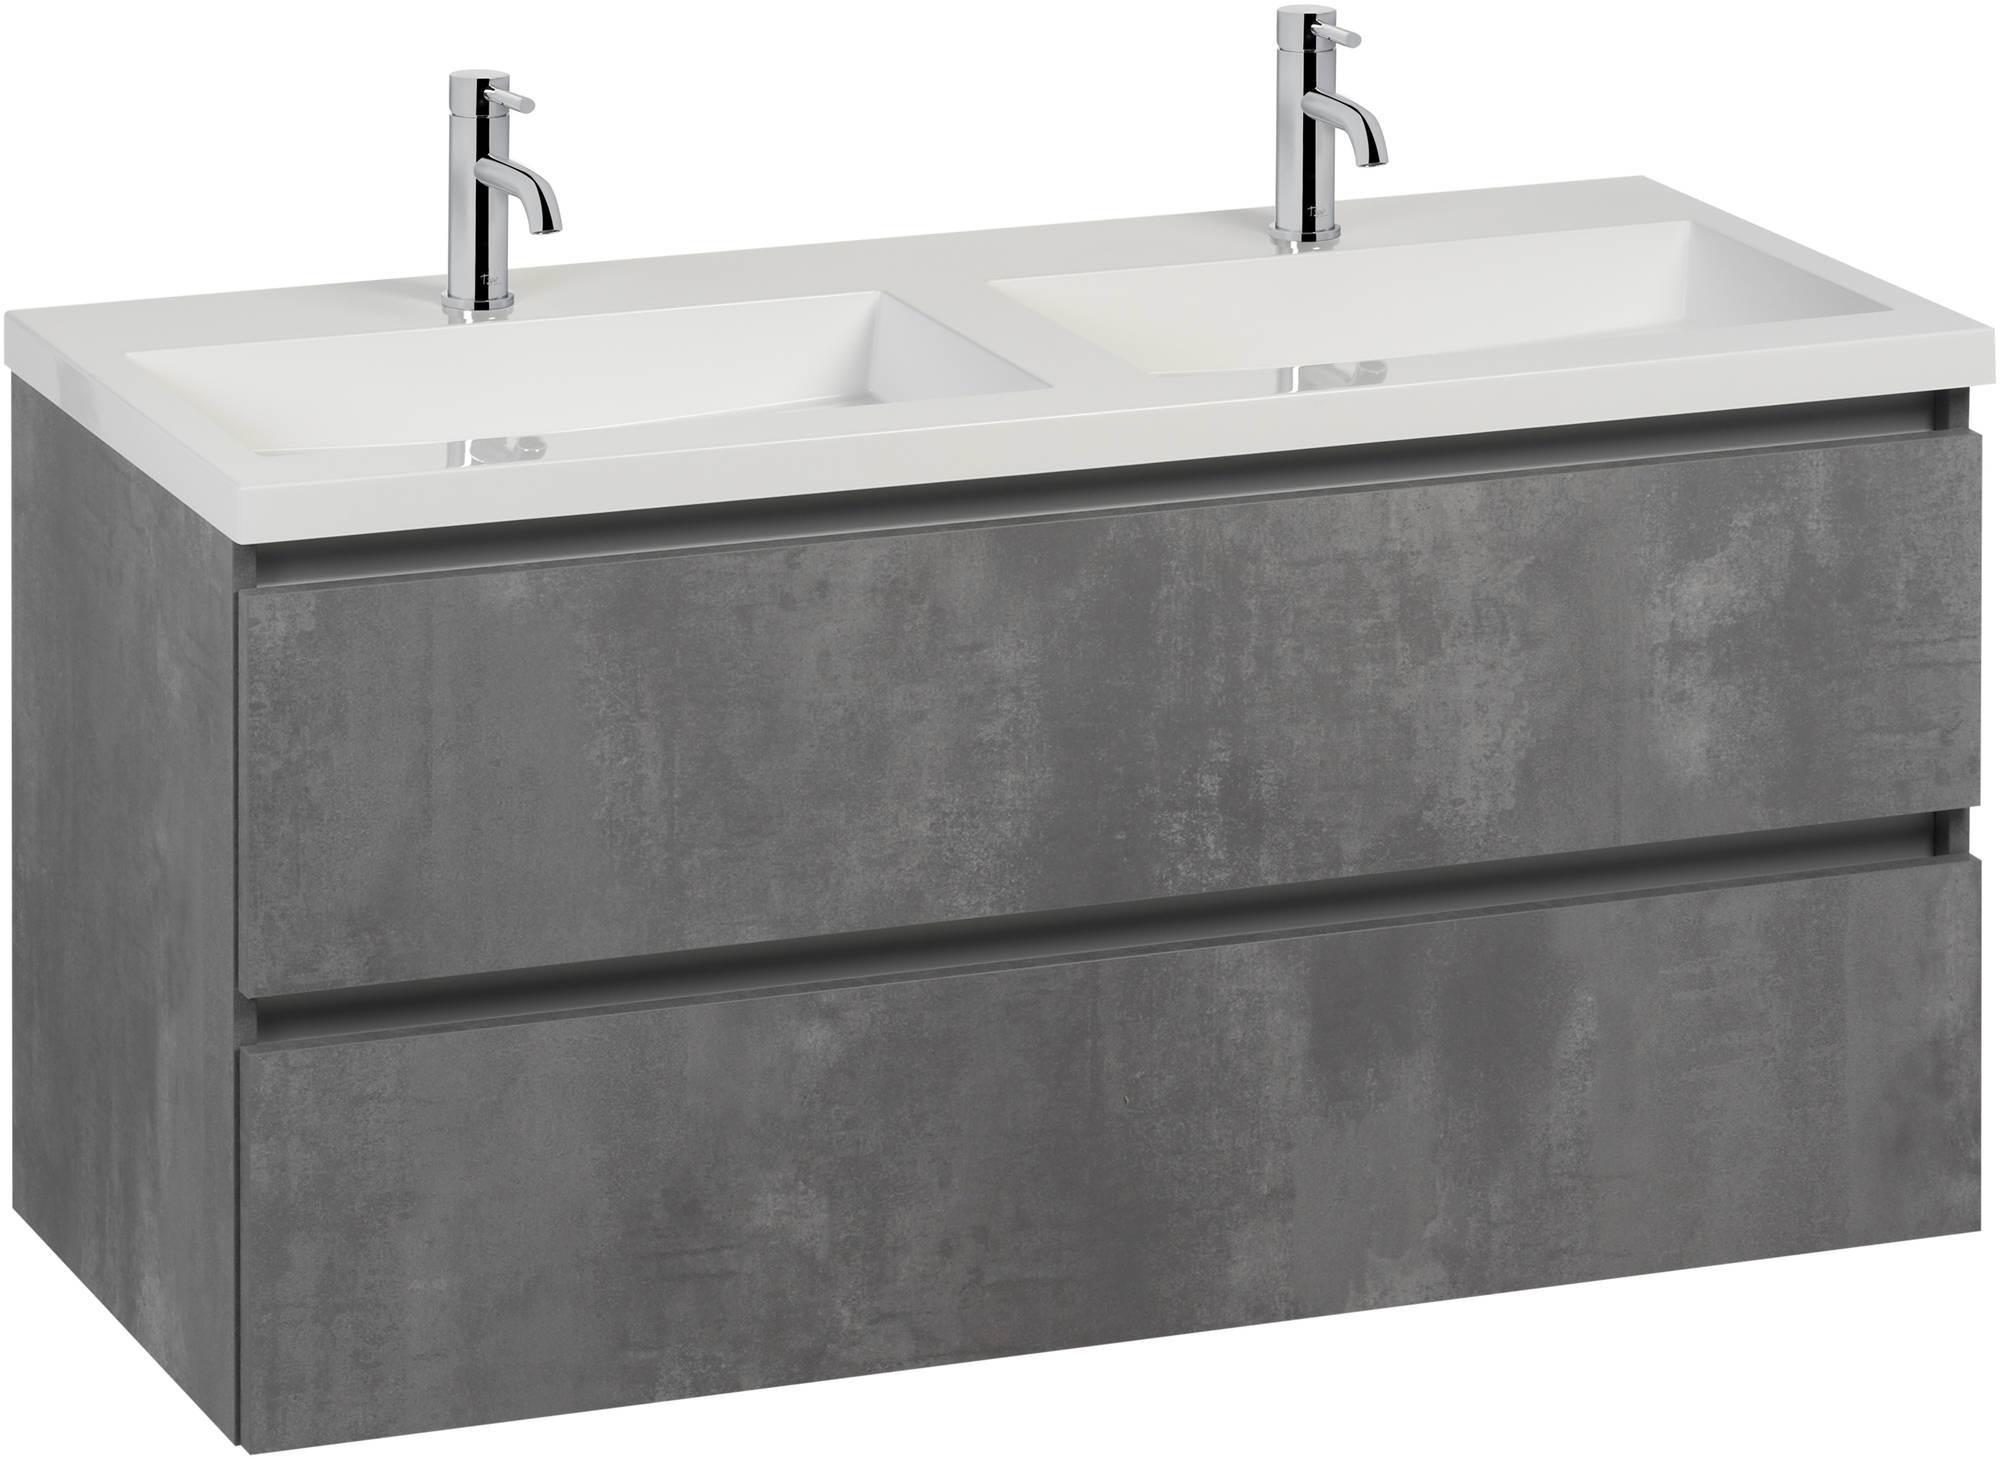 Saniselect Guarda badmeubelset dubbele wastafel 120x50,5x60 cm beton grijs